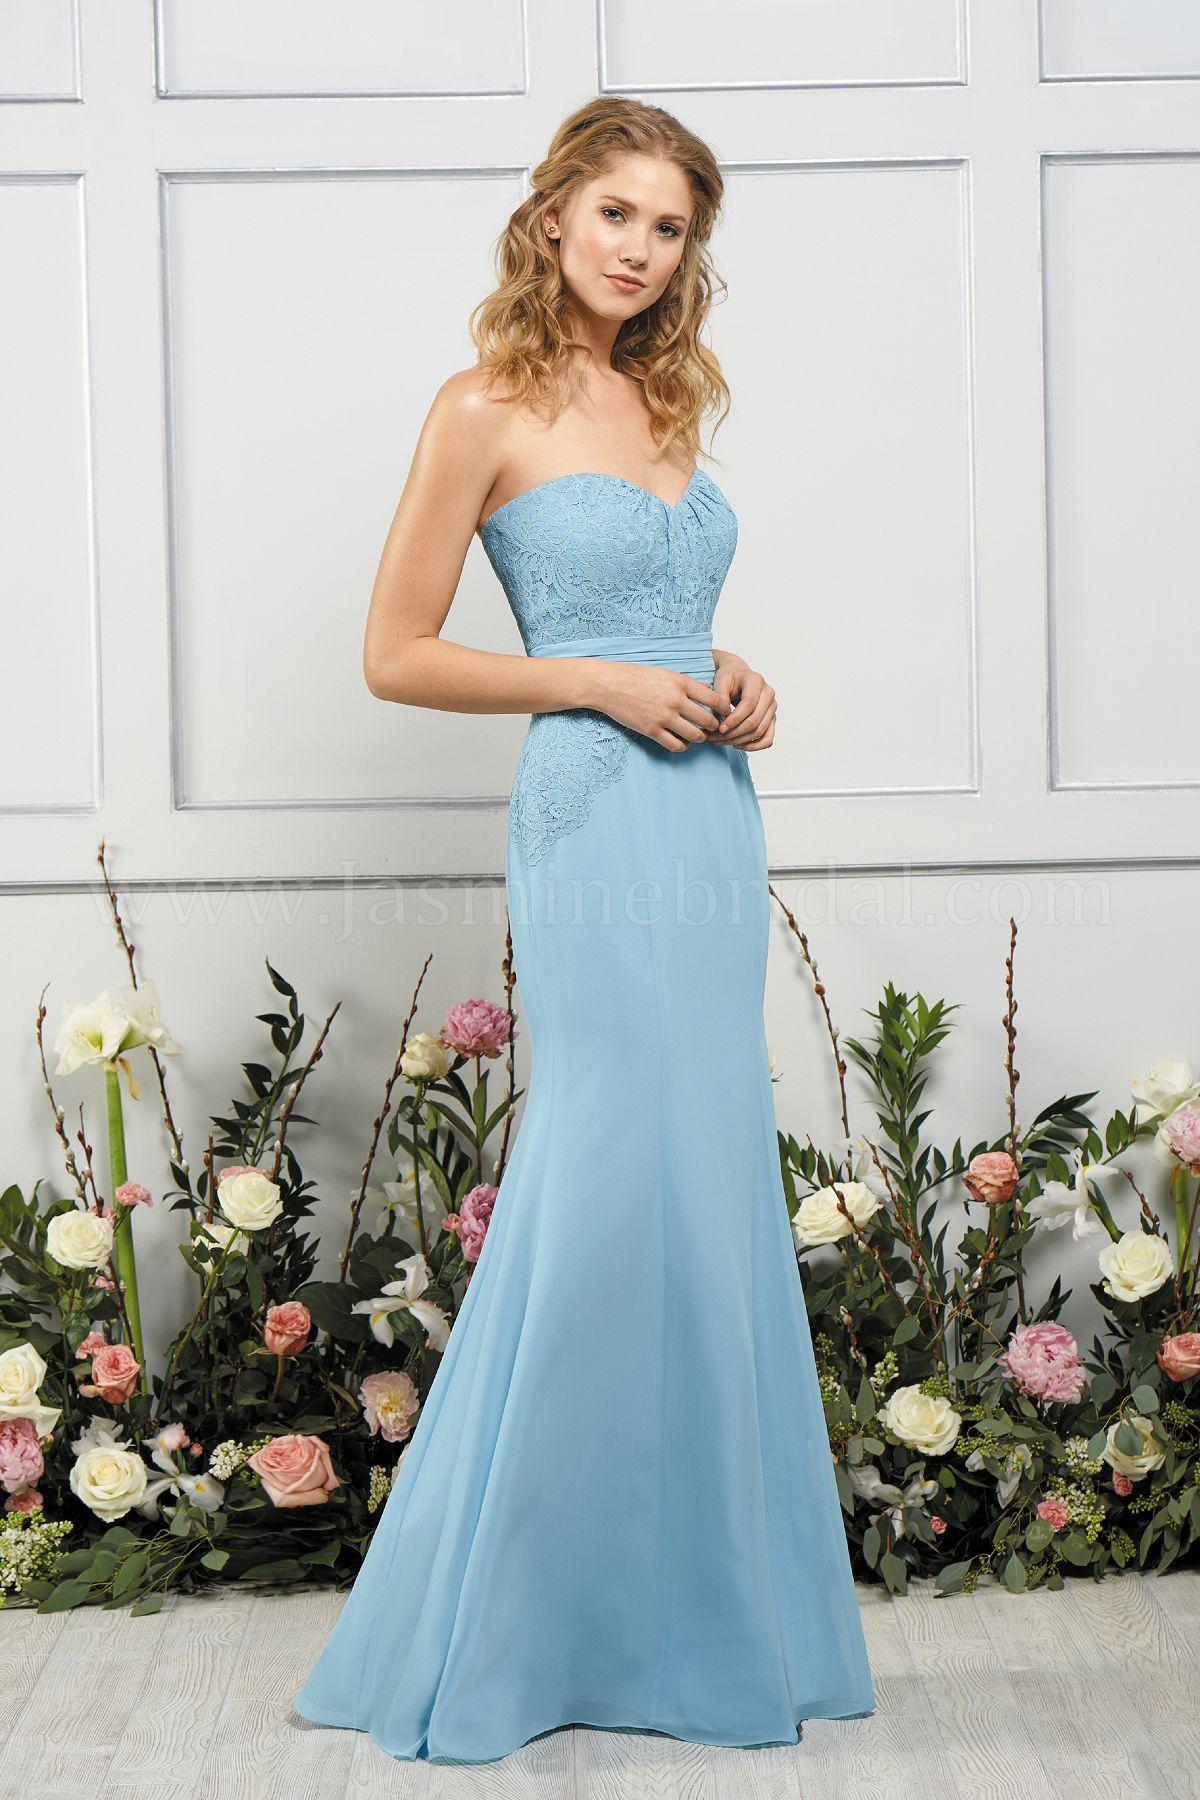 B2 Dresses Bridesmaid Dresses